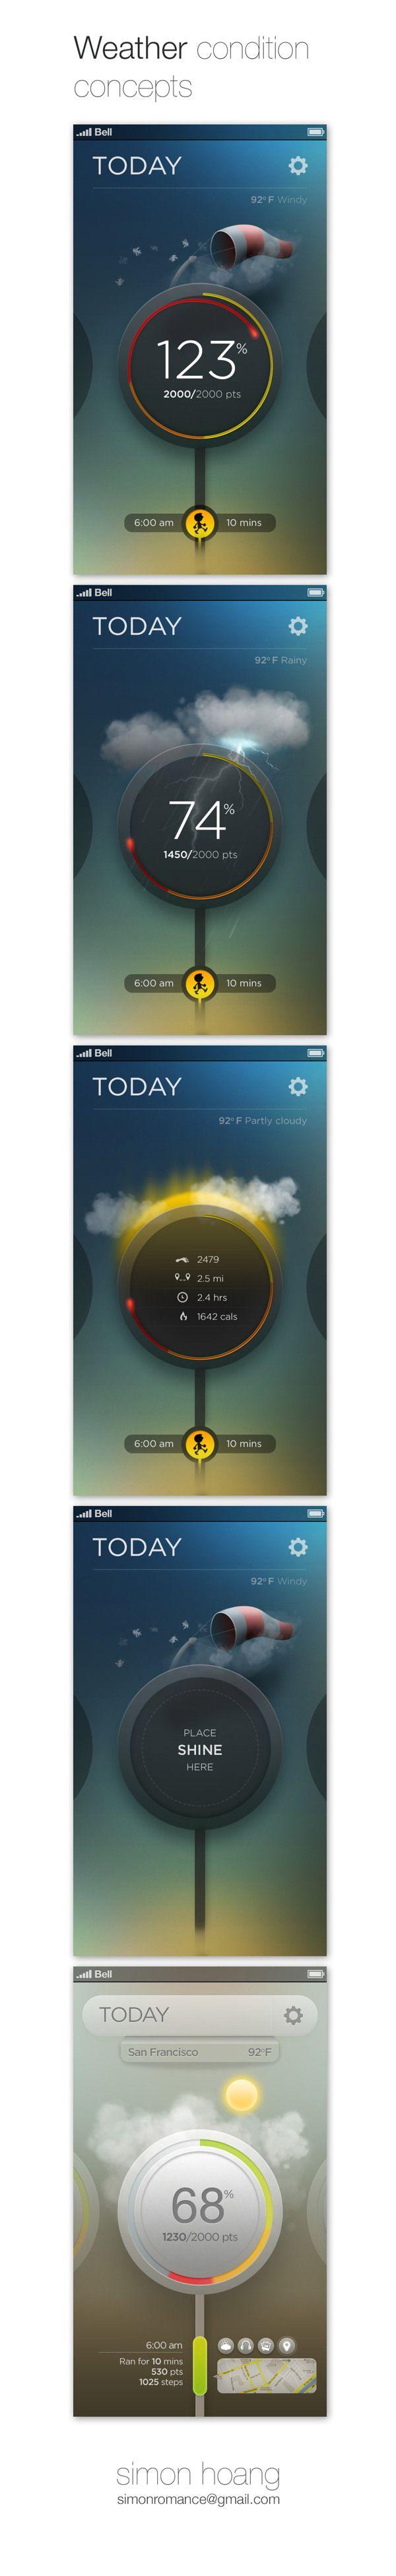 Weather Conditions UI Design